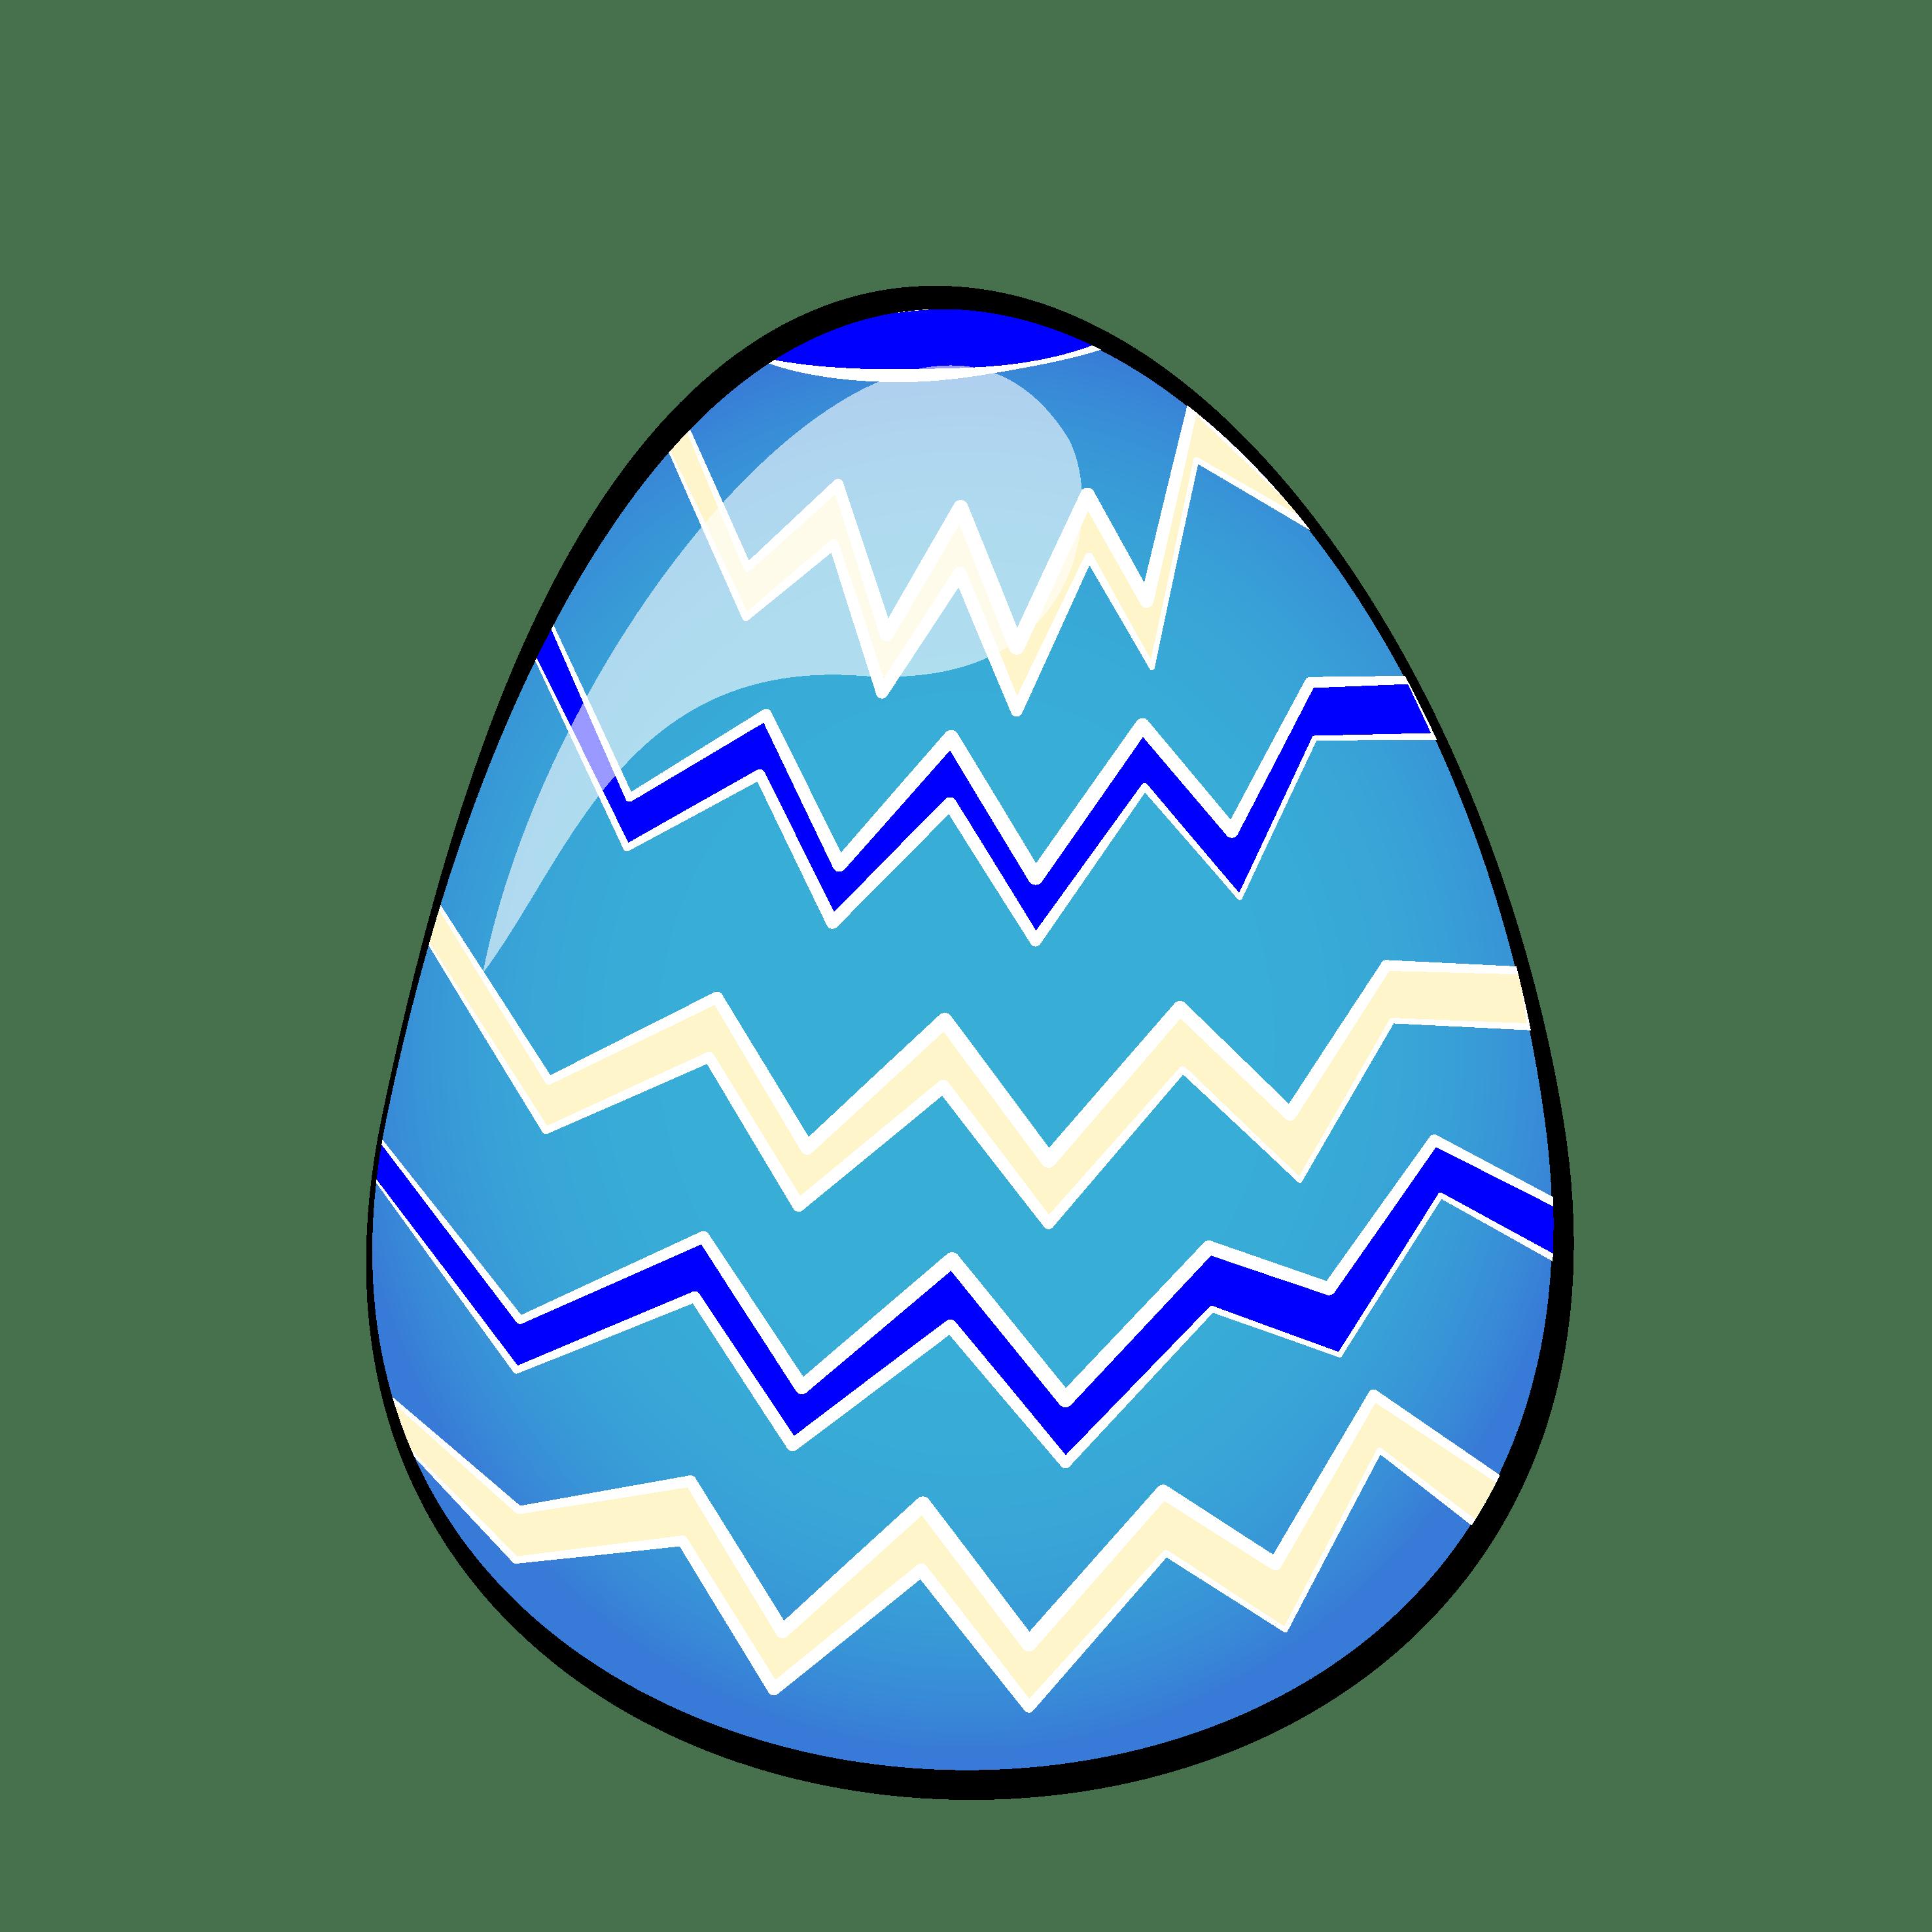 2953x2953 Easter Eggs Clip Art Free Gt Nastaran's Resources